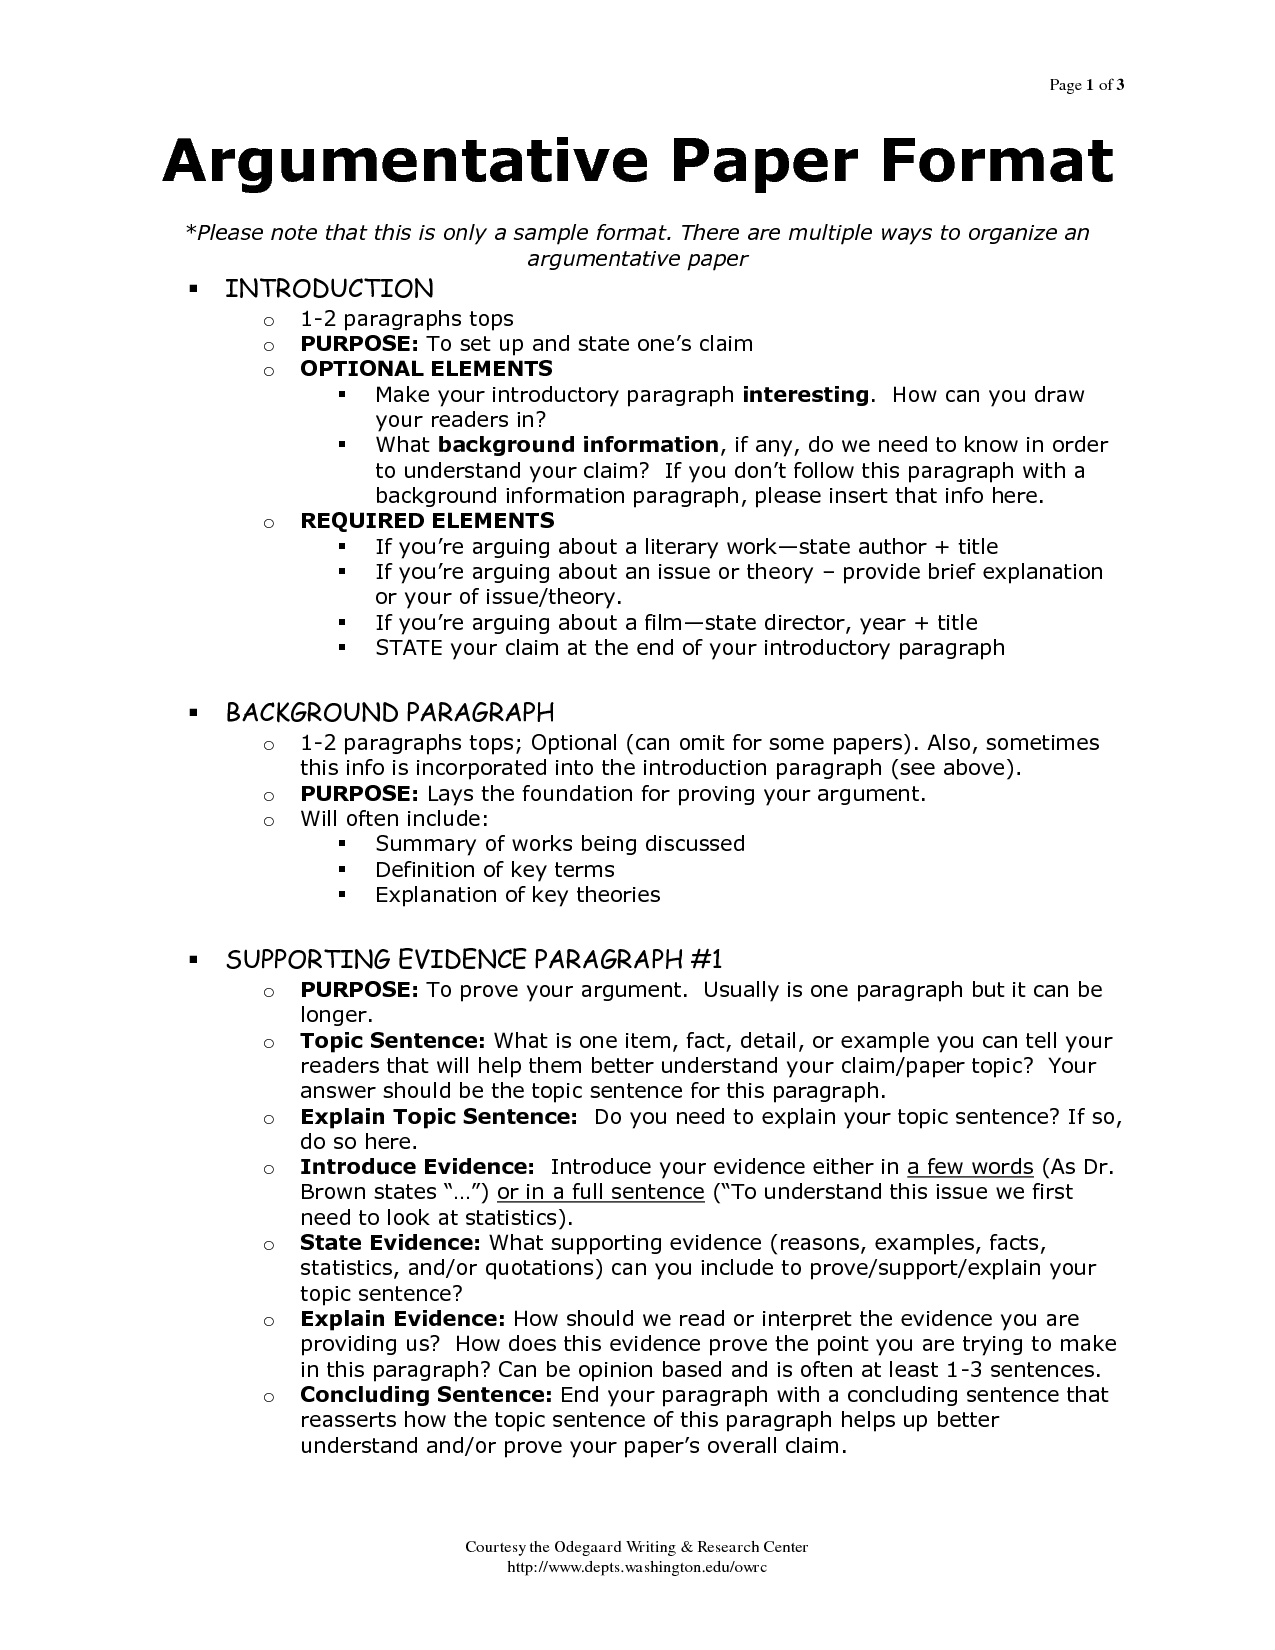 006 Sample Argumentative Essay Awful Outline Middle School Apa Format Ap Argument Prompts Full